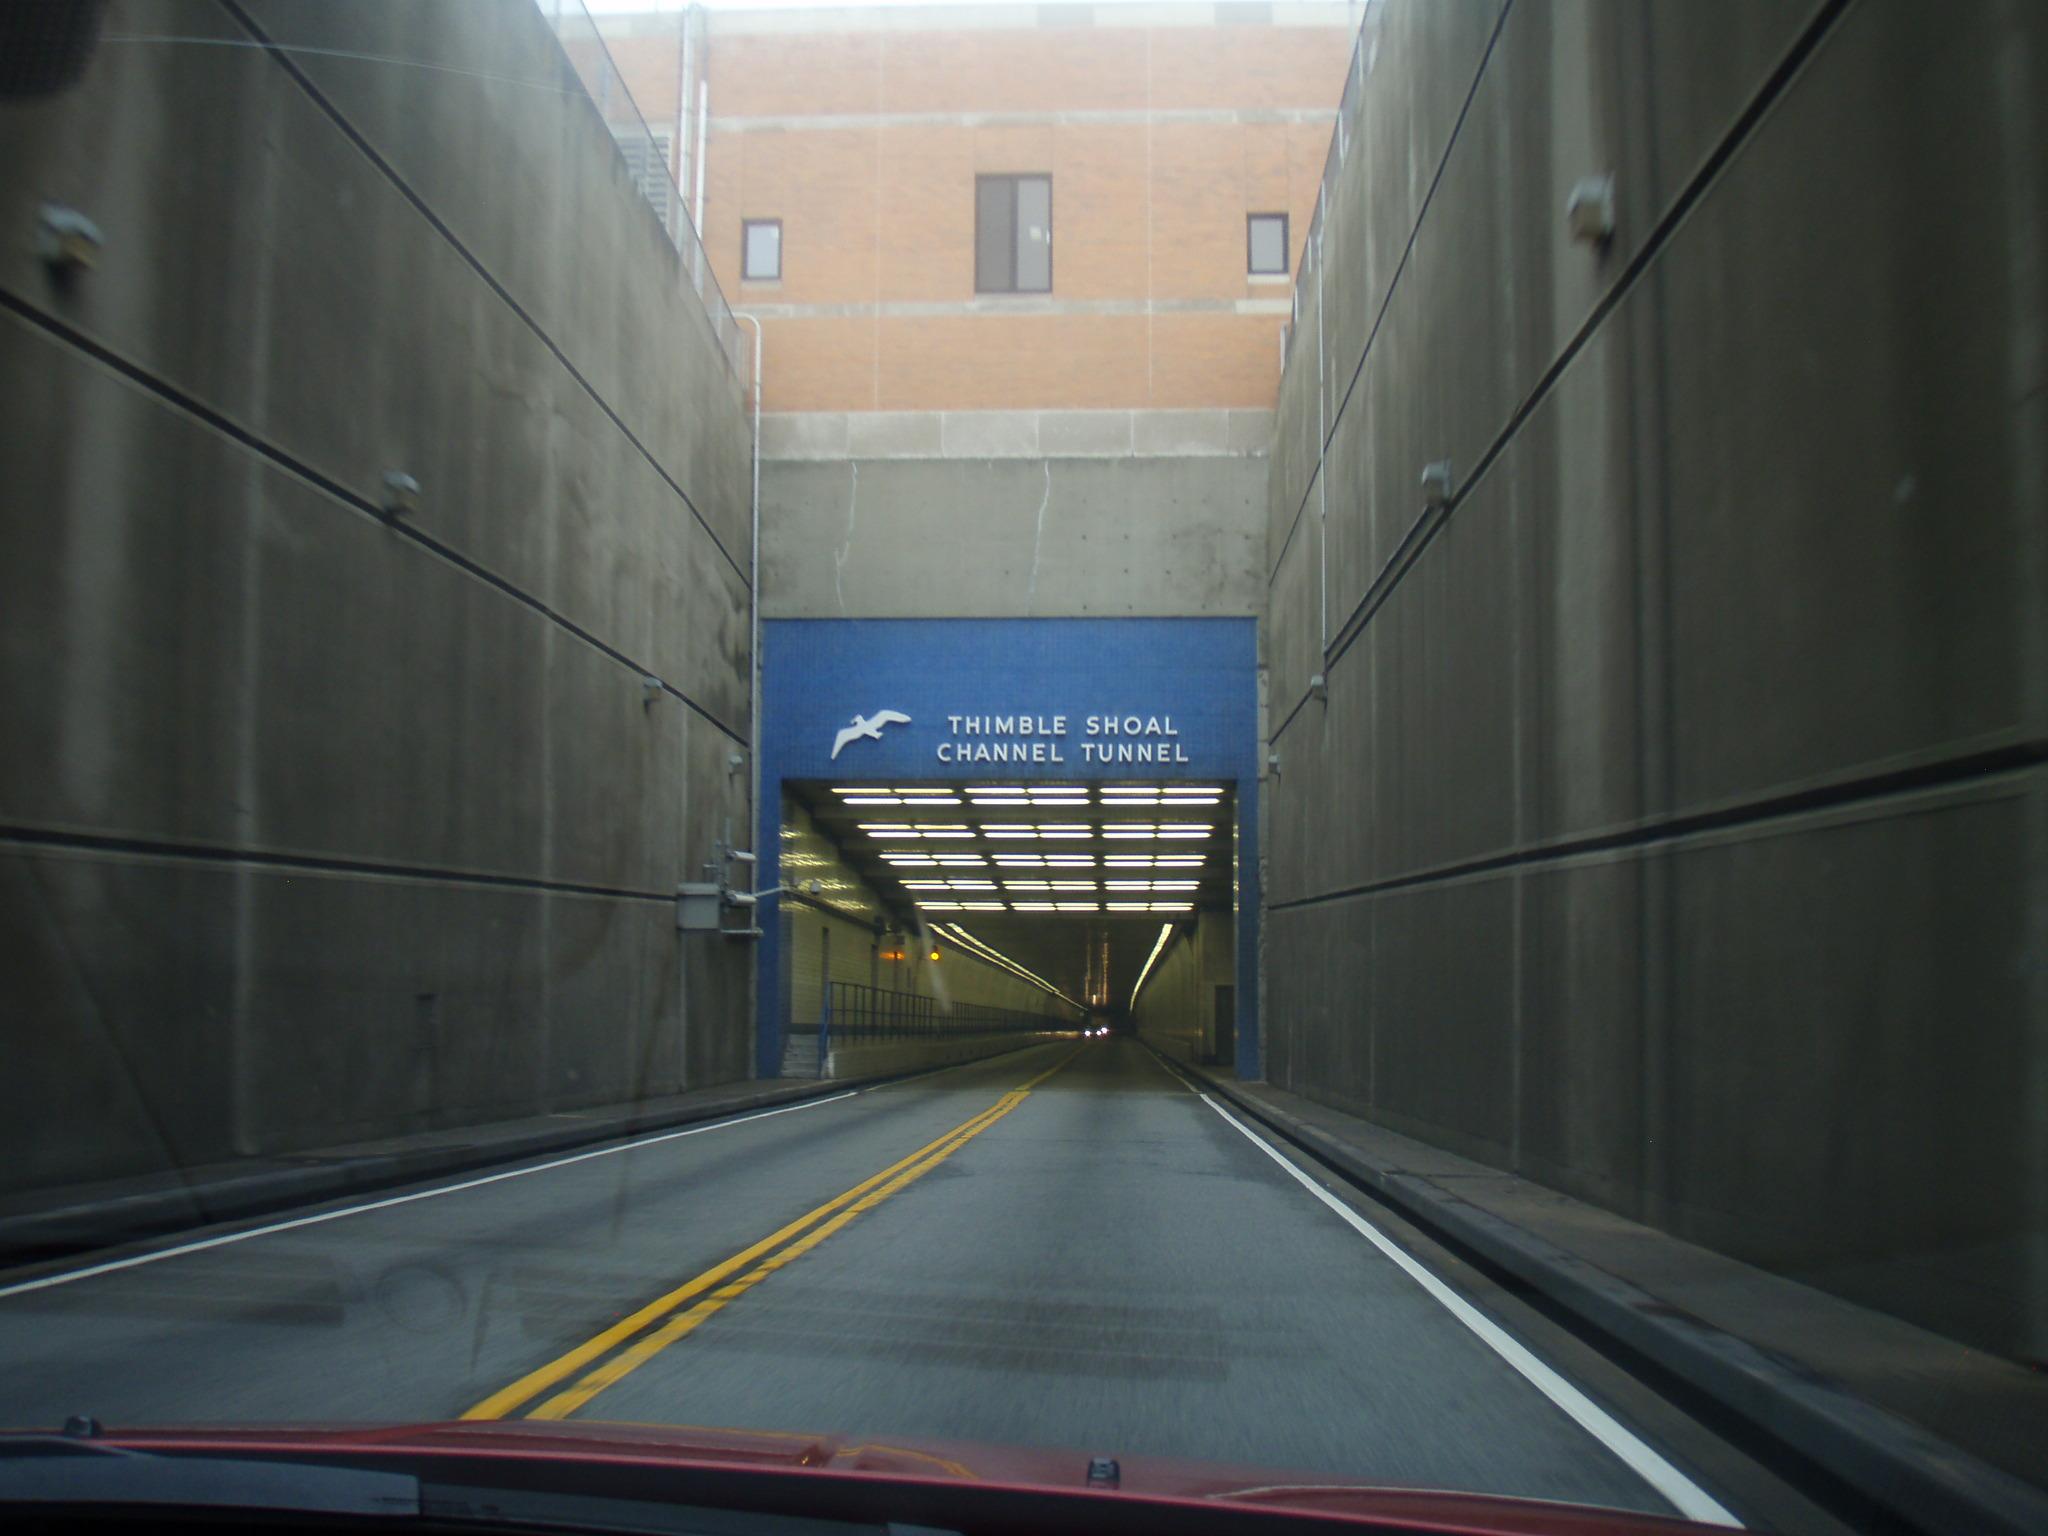 Chesapeake Bay Bridge-Tunnel – Not Your Average Engineer